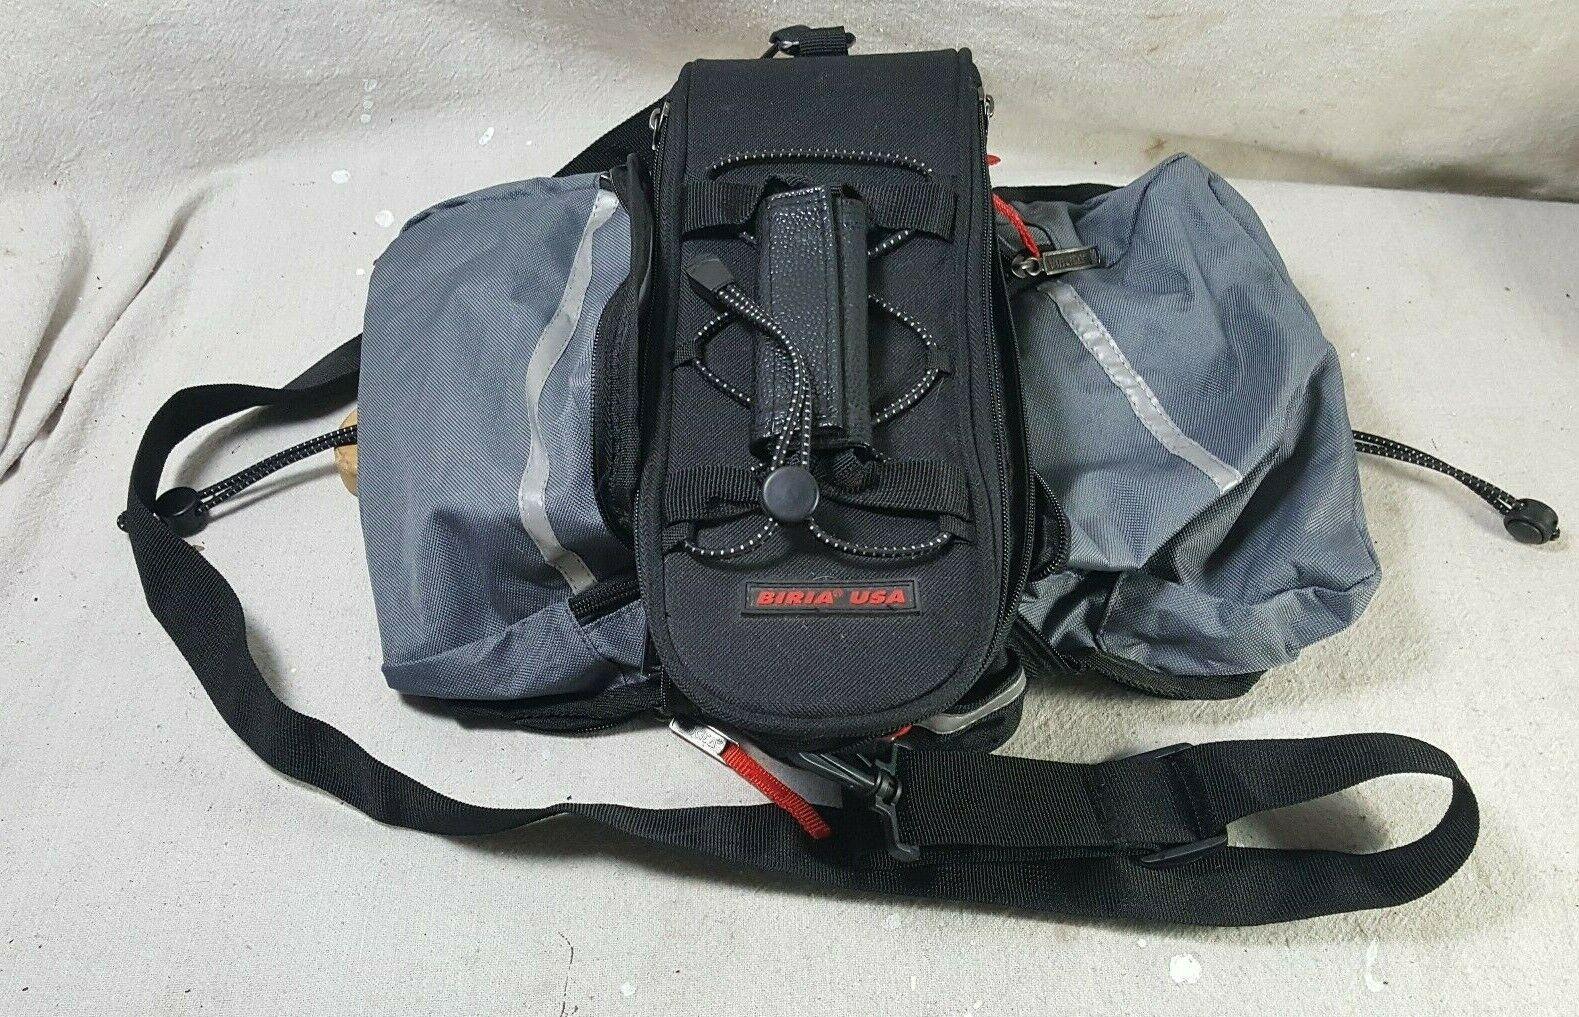 Bria  USA Exanding Bike Saddle Carry Bag w Handle and Shoulder Strap  novelty items